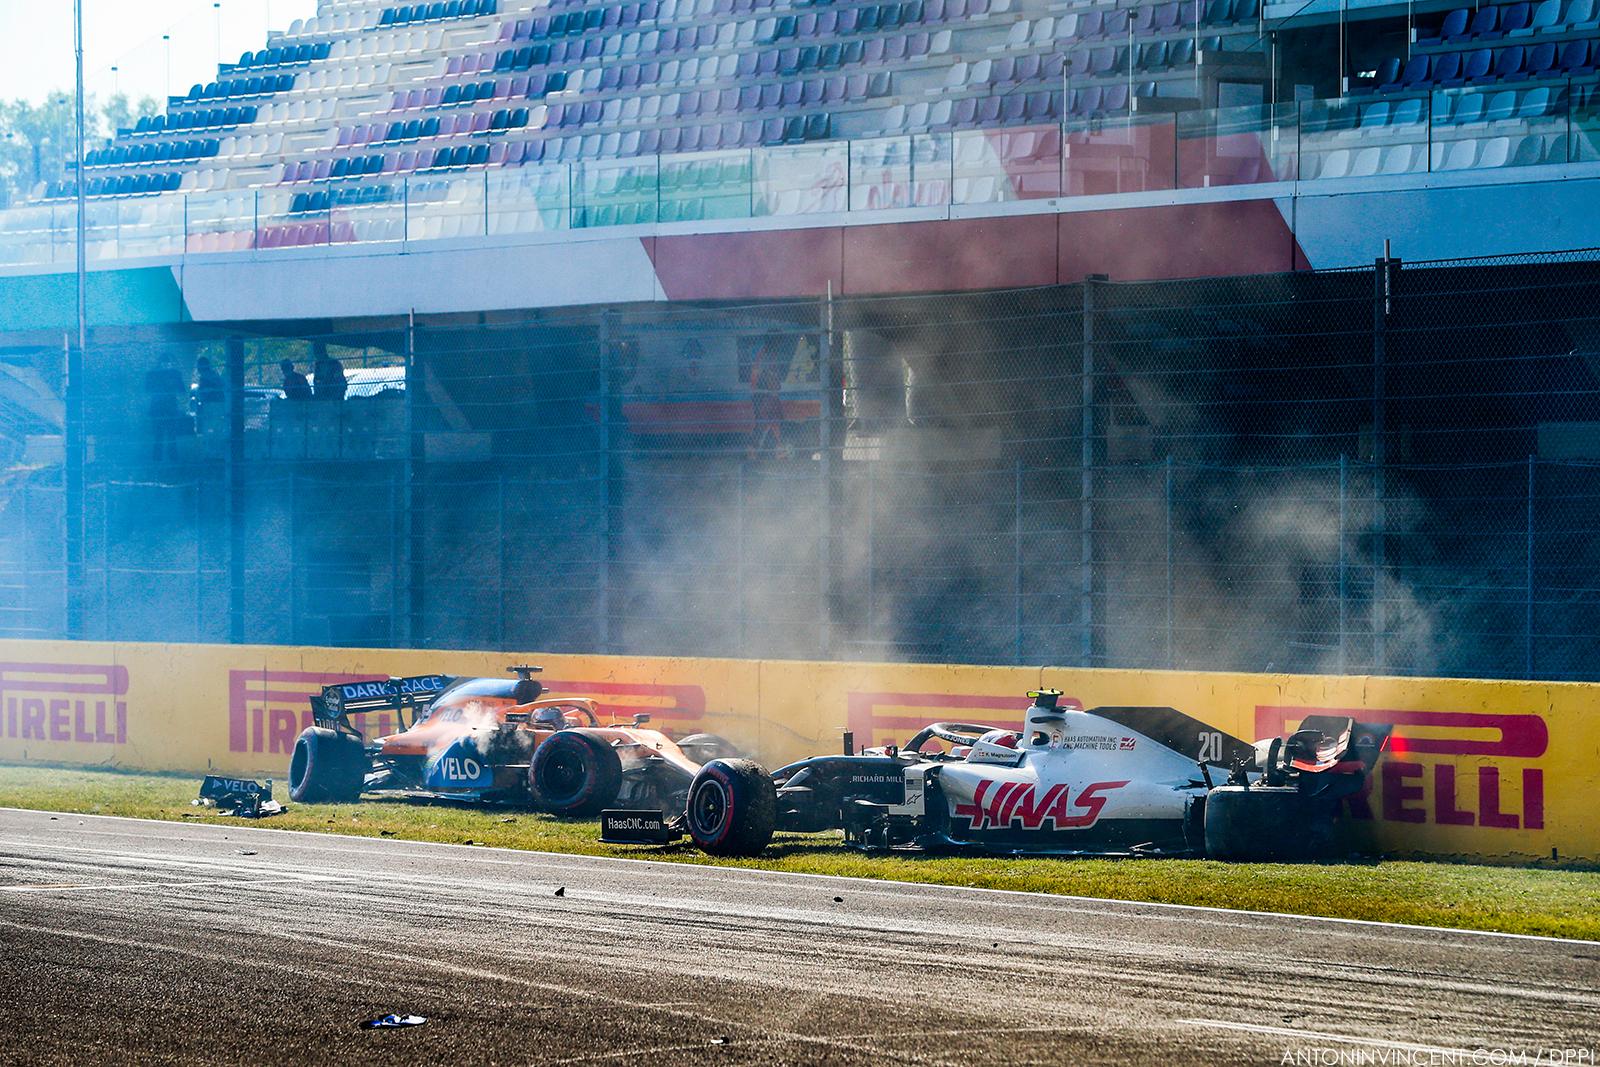 F1 – TUSCAN GRAND PRIX 2020 – PART 2